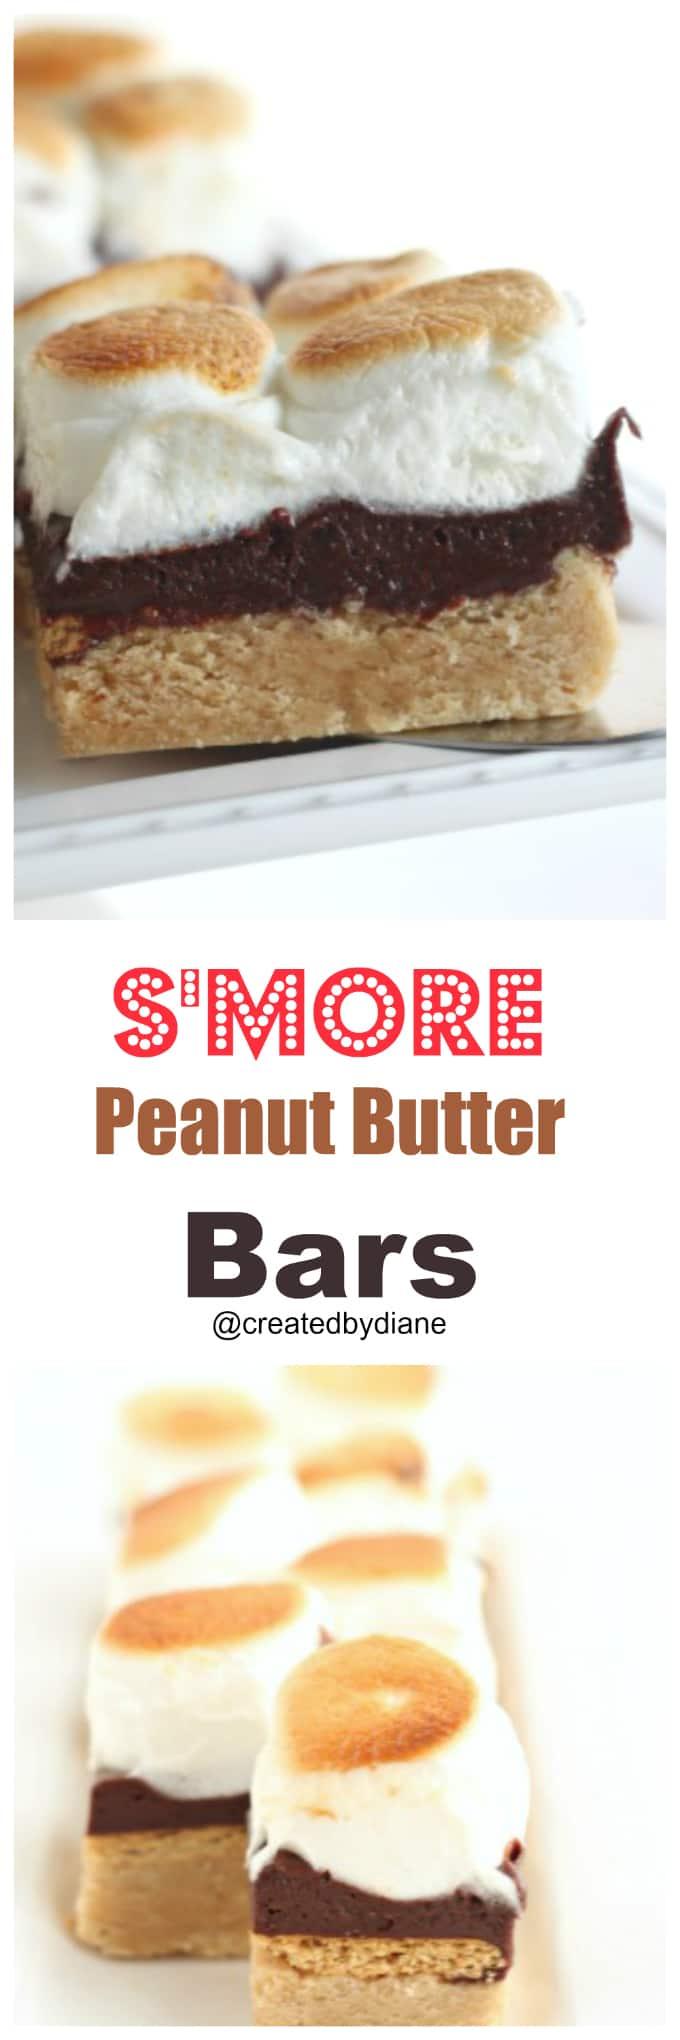 smore-peanut-butter-bars-createdbydiane